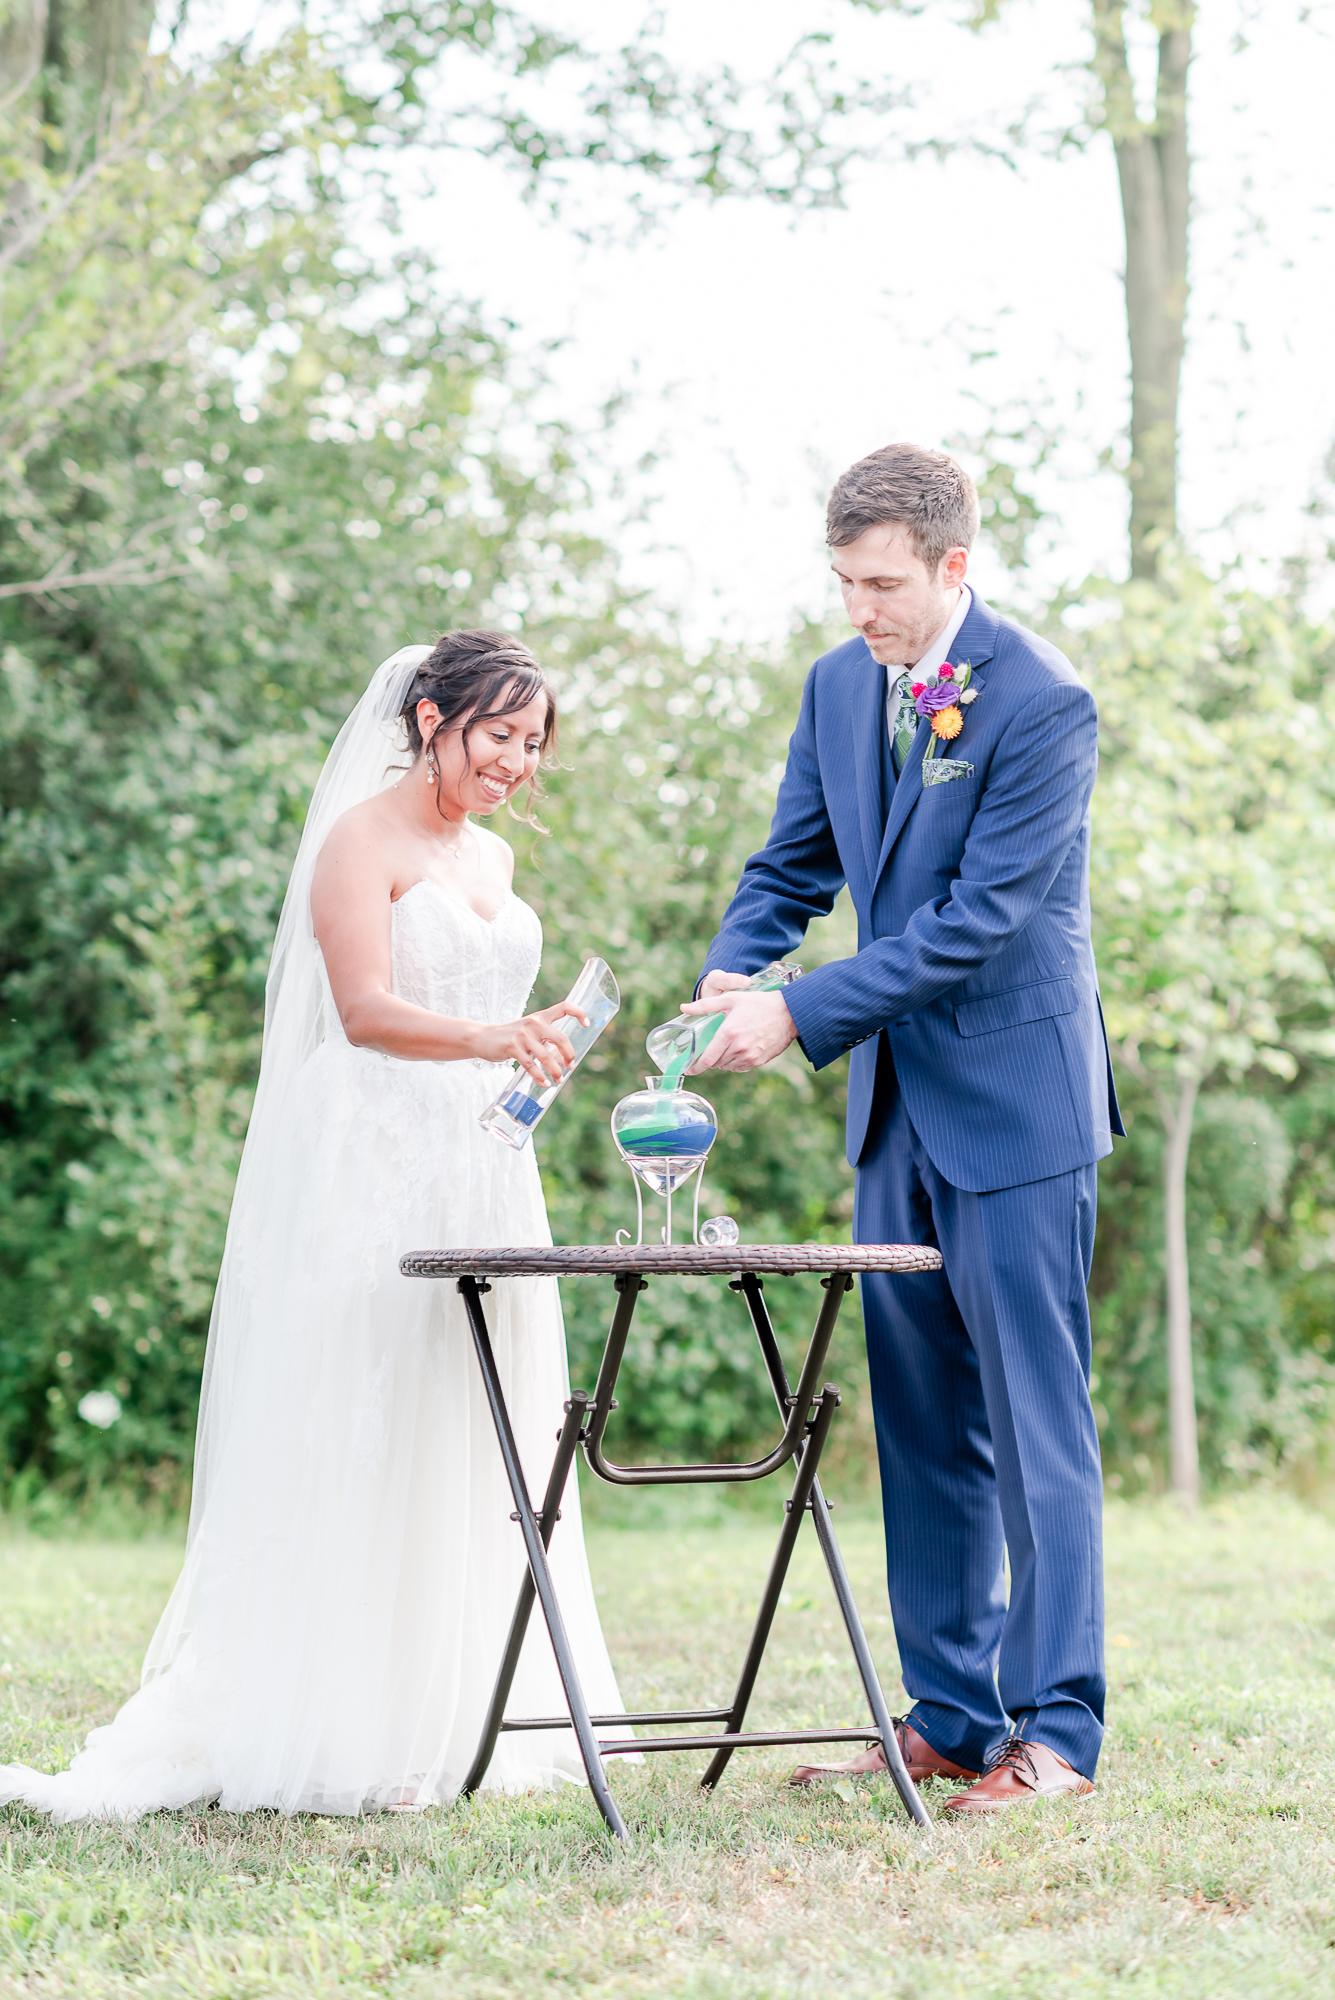 Maria+Adam_Summer Barn Wedding_The Barn at The North Star Preserve_Oberlin_Ohio-173.jpg